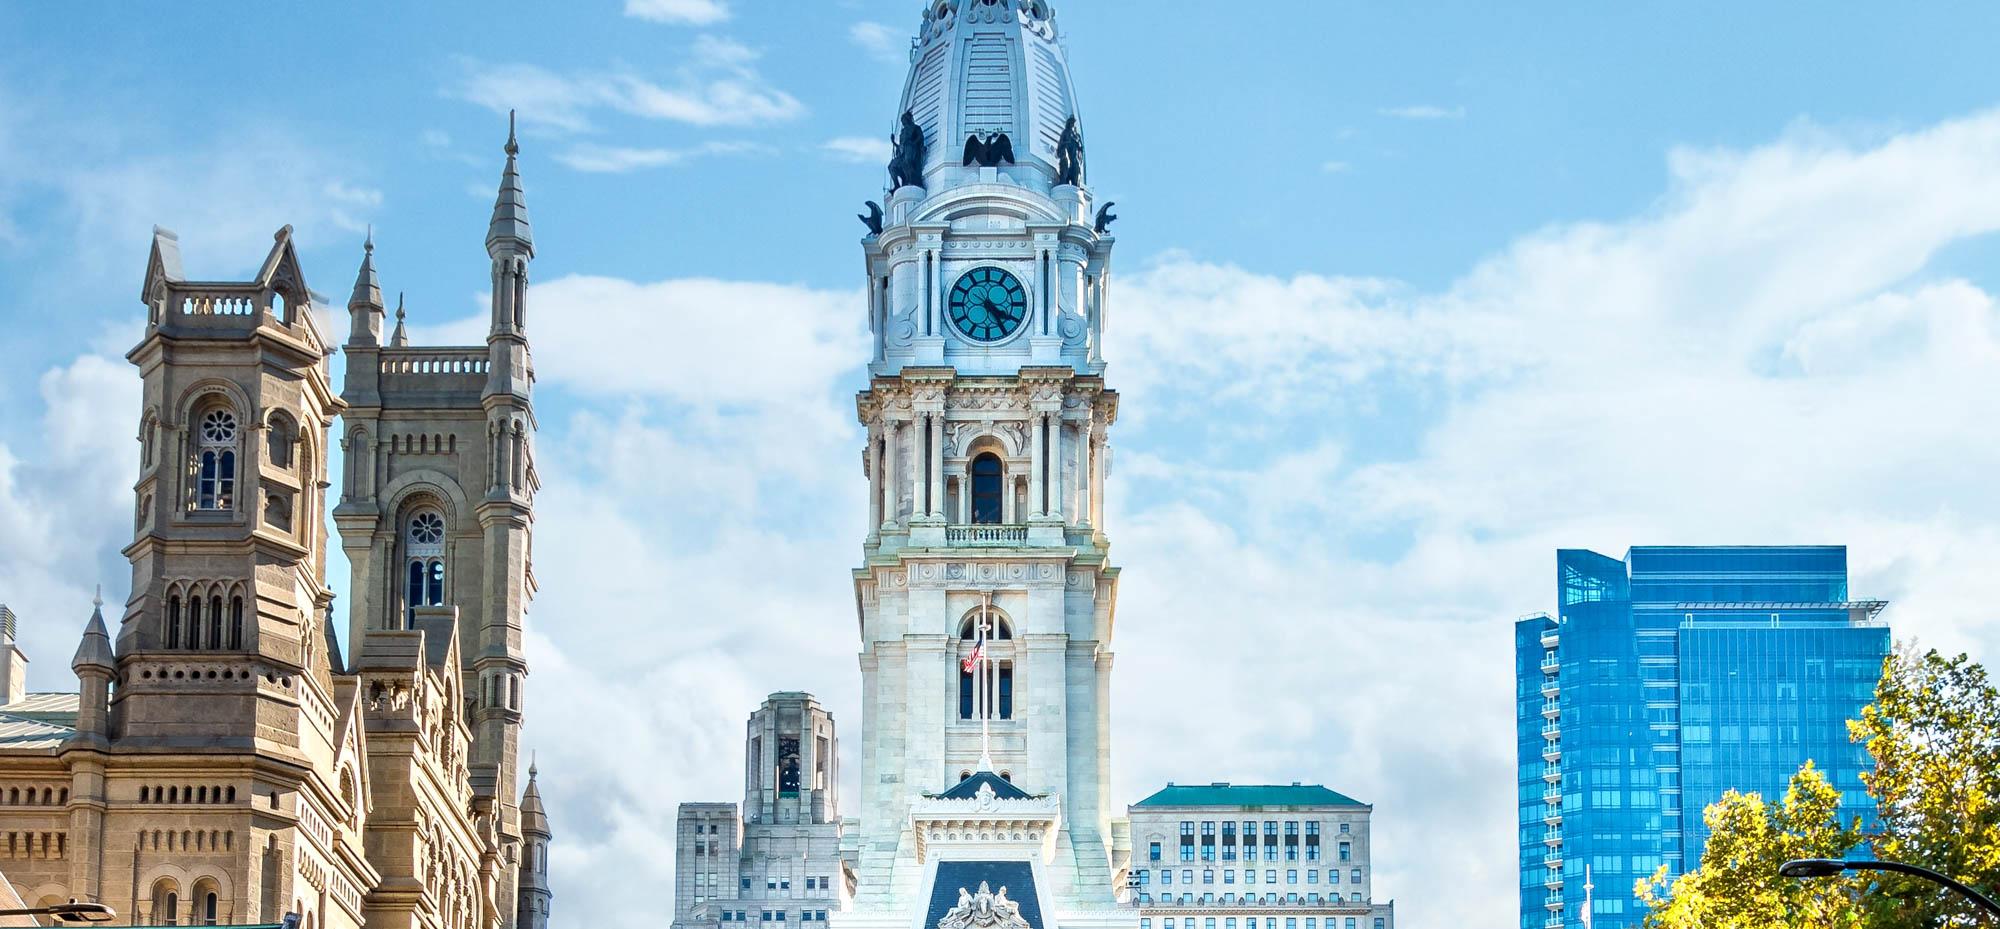 Large buildings in Philadelphia